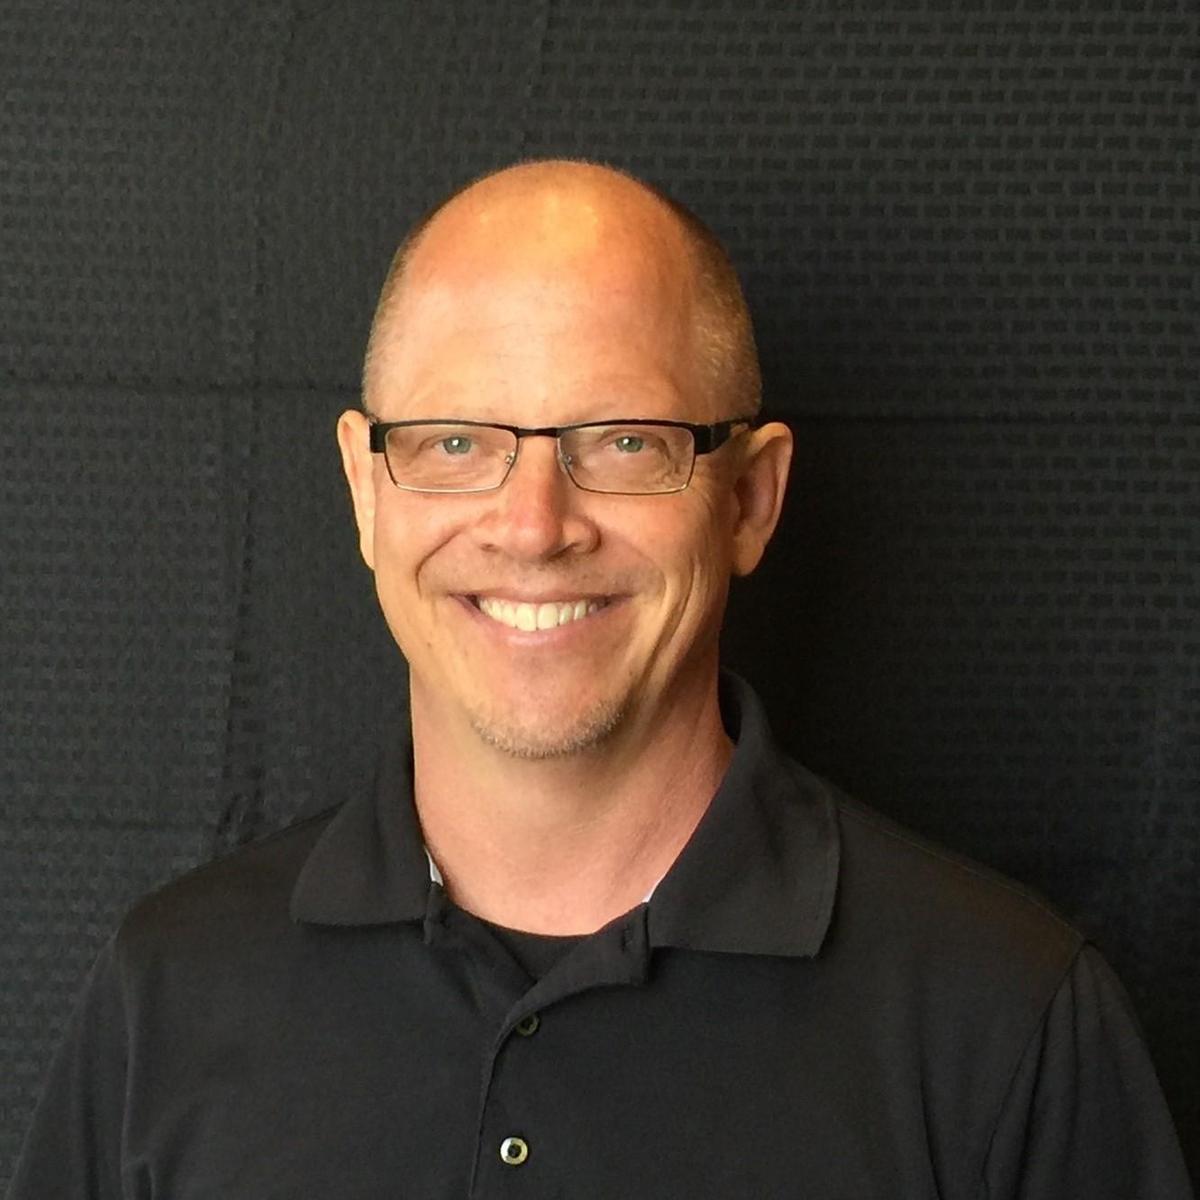 head band director david edge